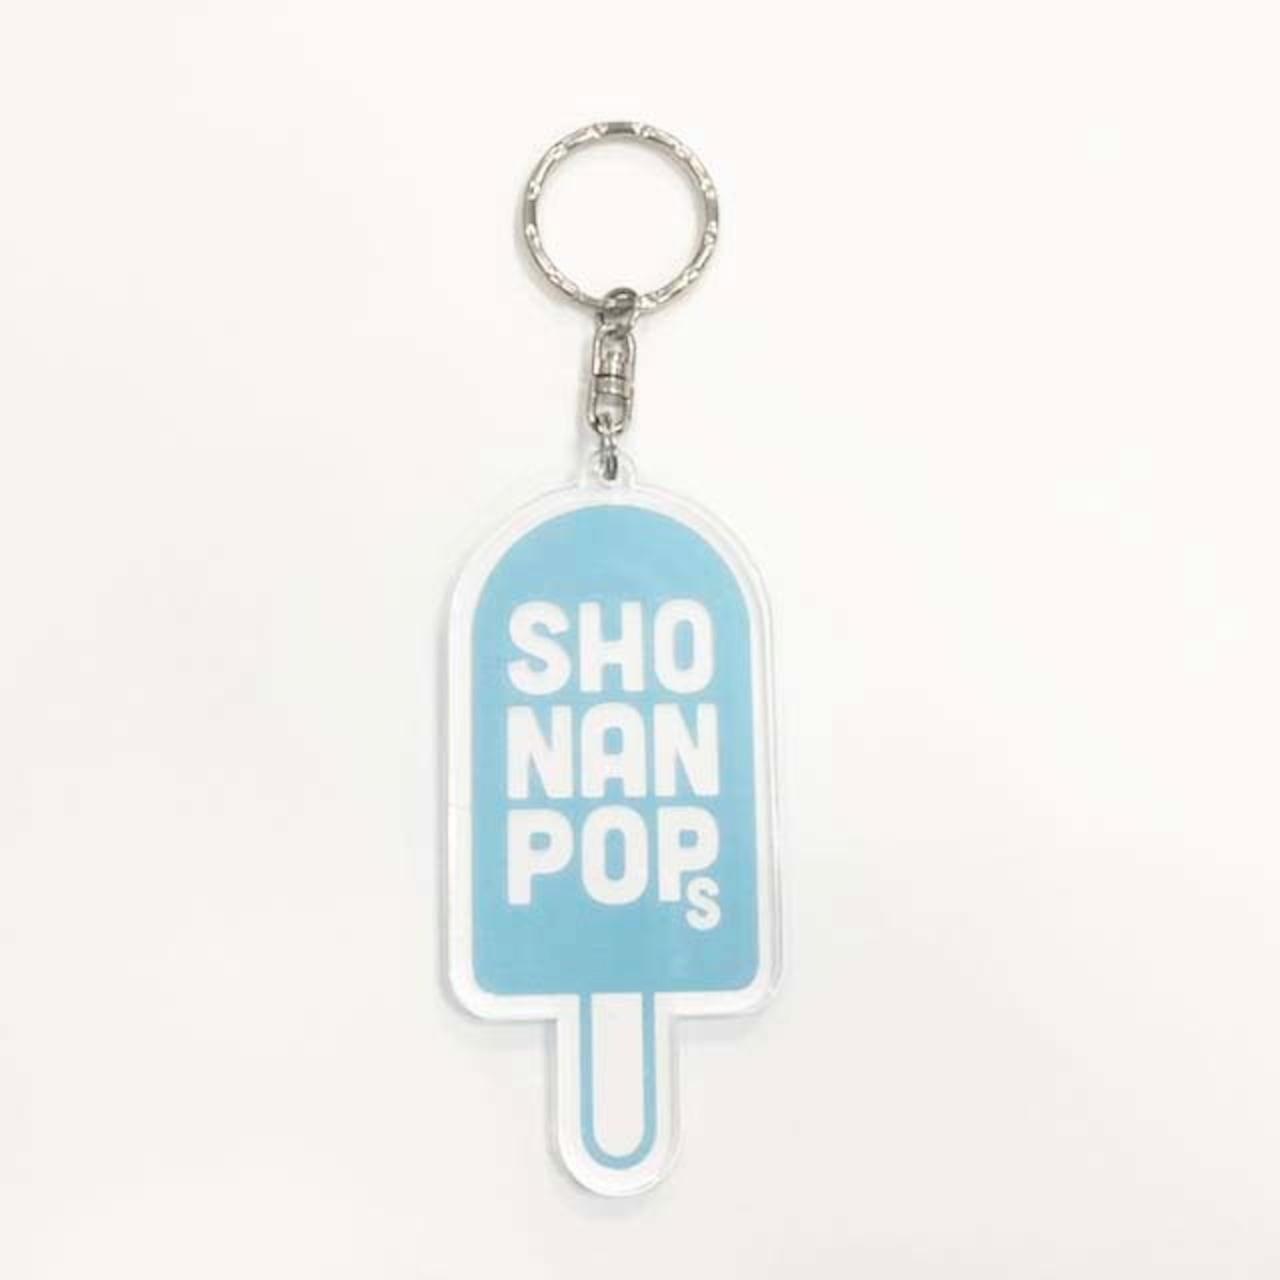 【SHONAN POPs】キーホルダー(M)